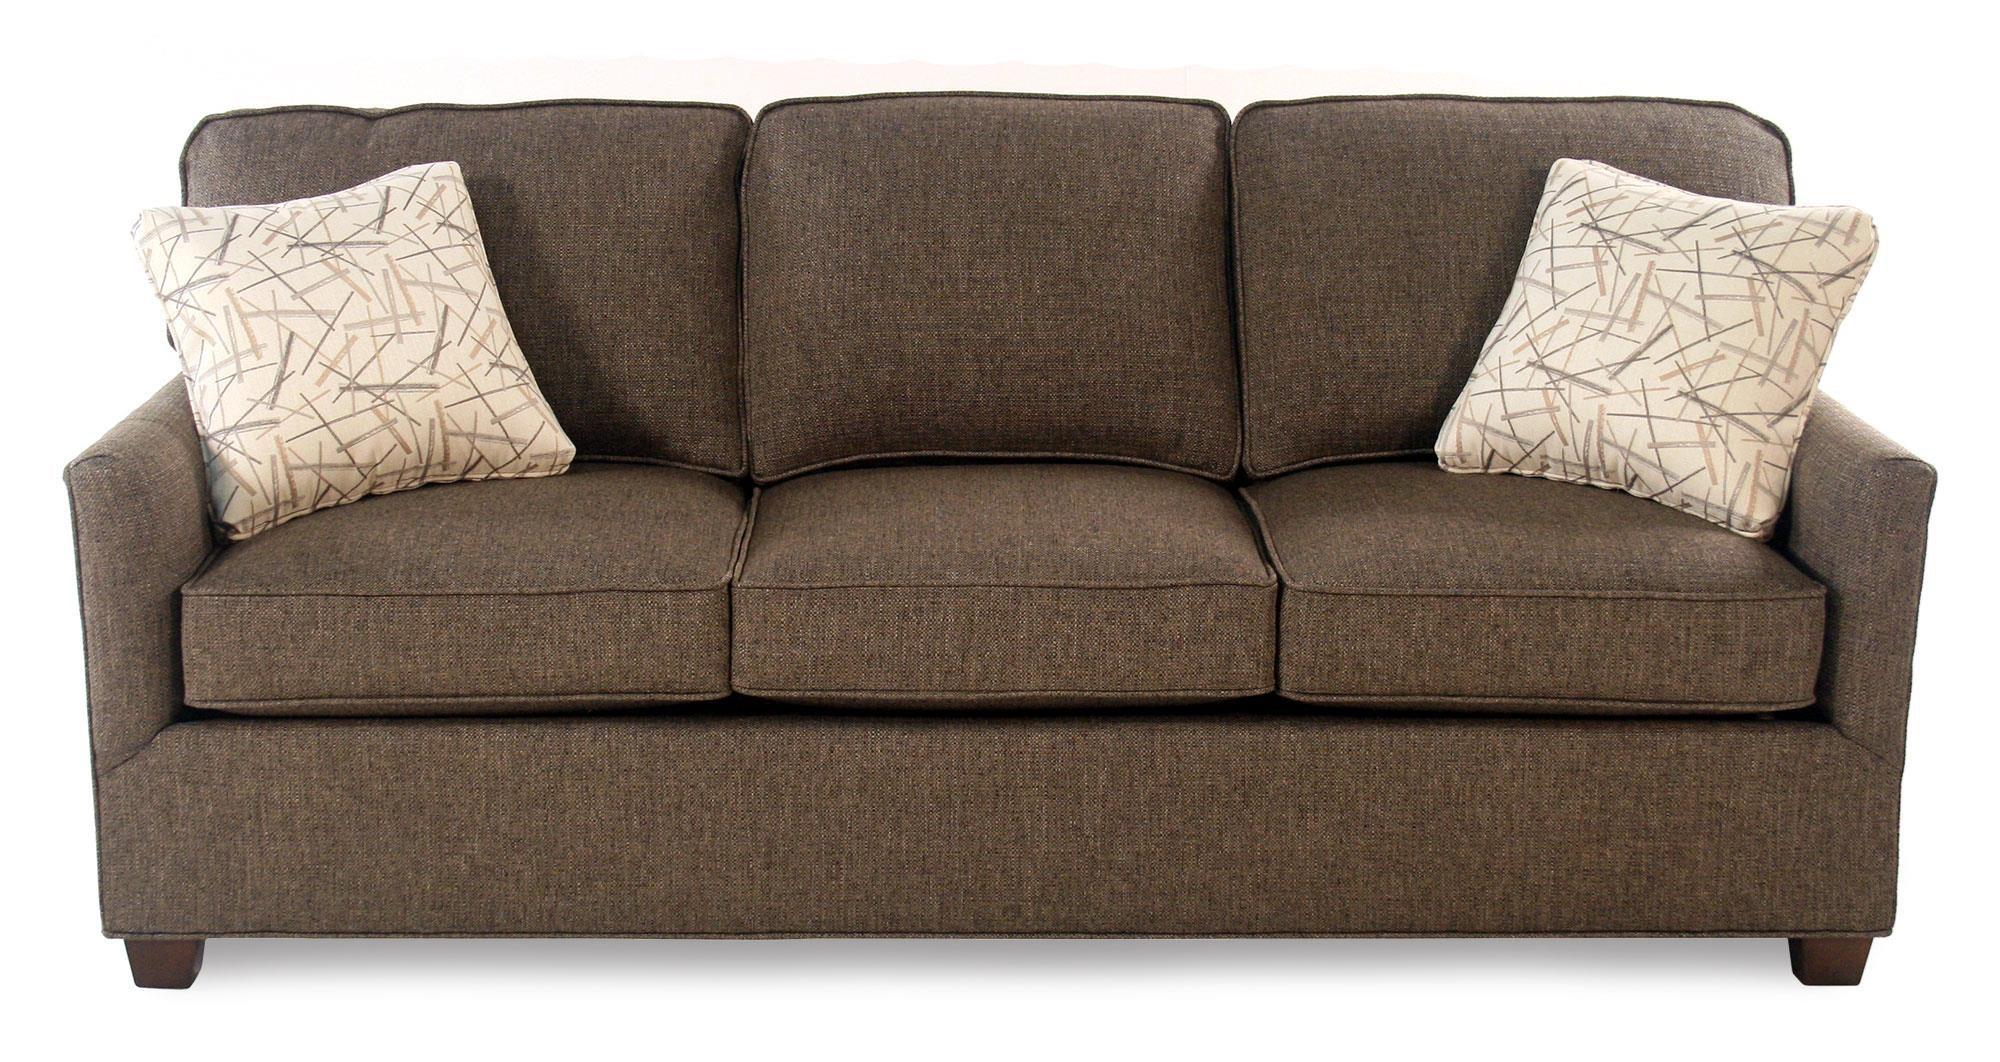 Hallagan Furniture Highland Park Sofa   Item Number: 44 ABT MR D3